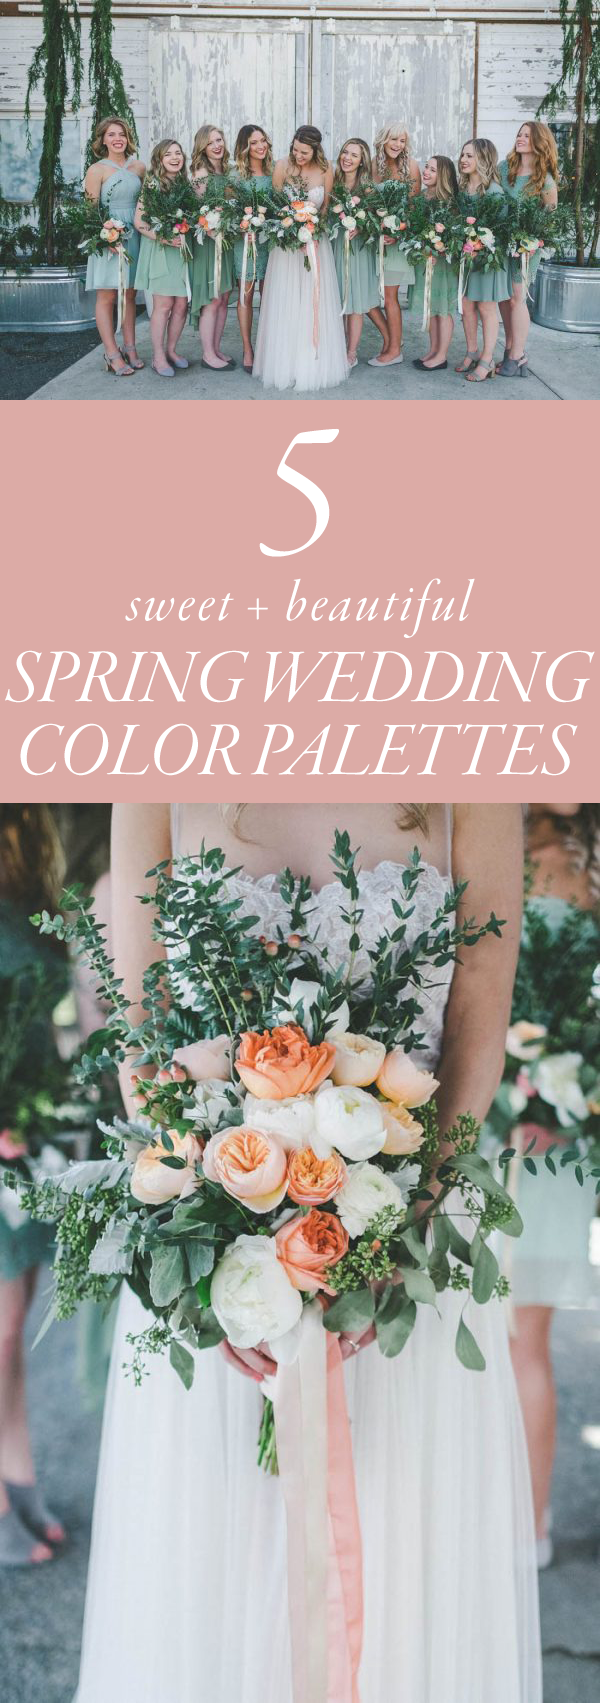 Spring Wedding Colors.5 Sweet Spring Wedding Color Palette Ideas Junebug Weddings